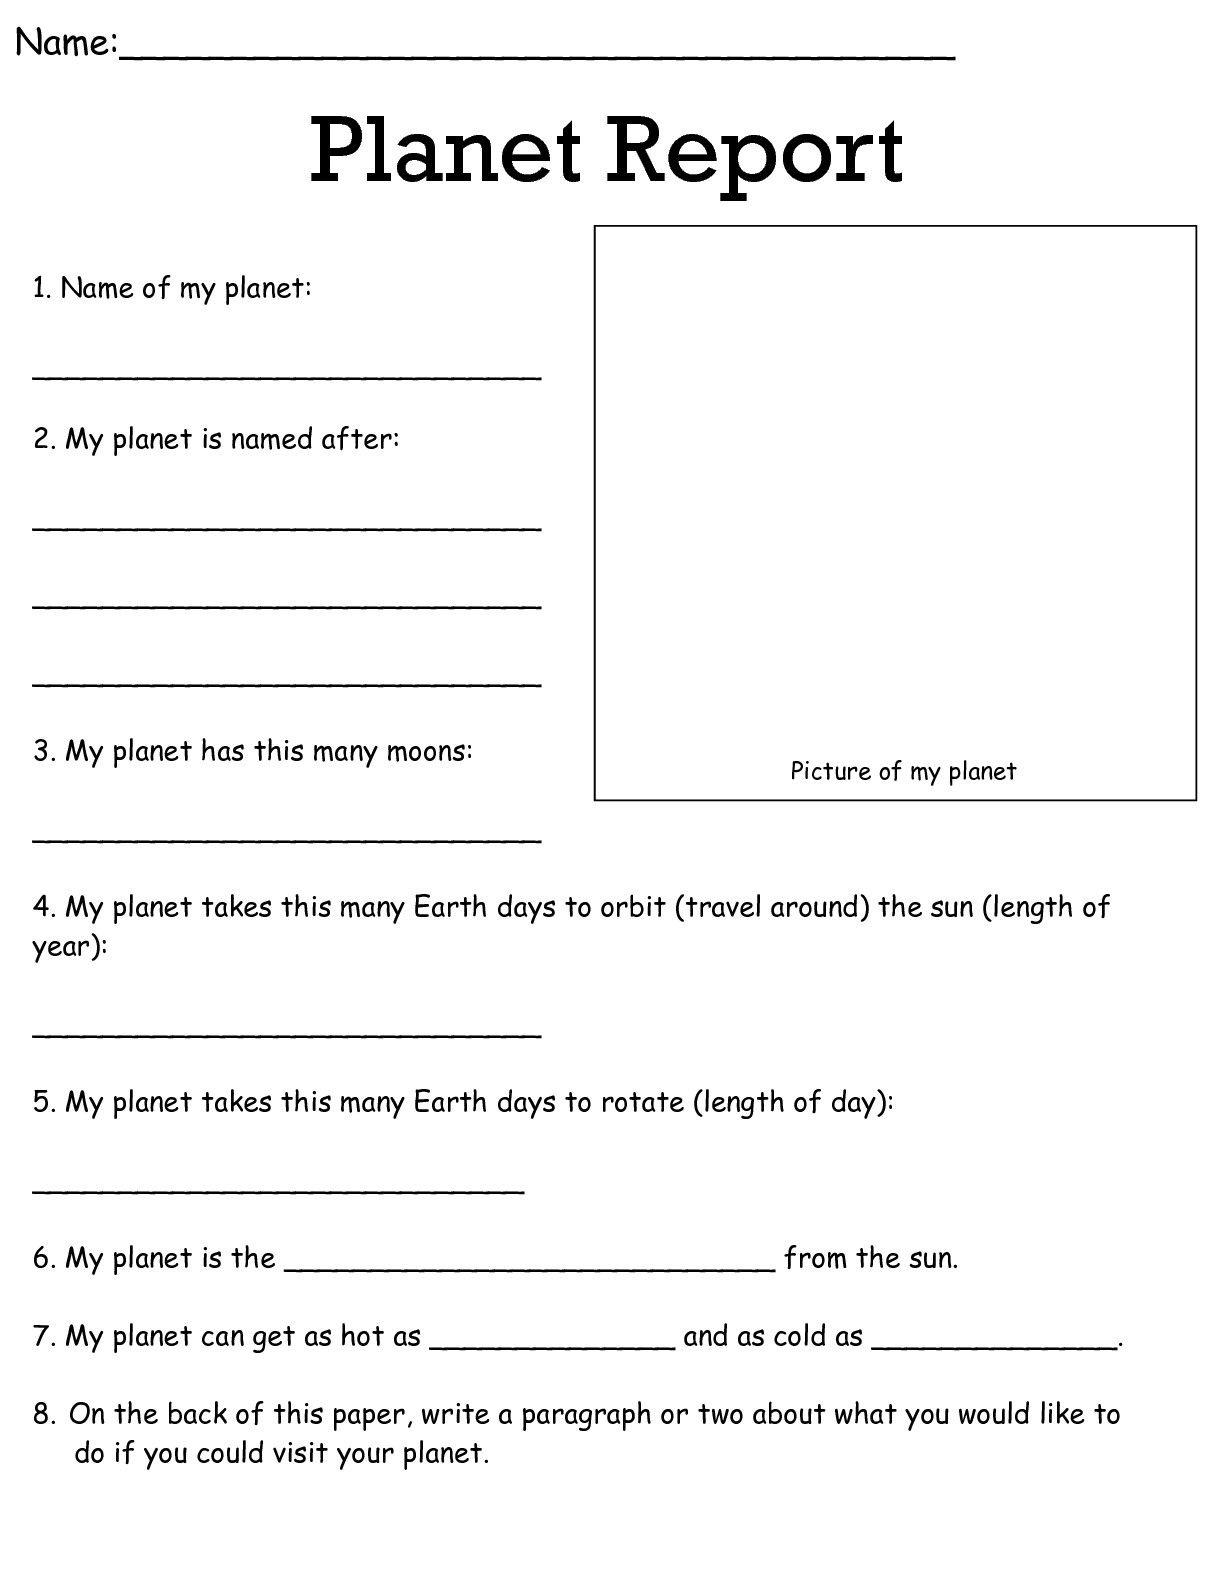 Job Worksheets 5Th &6Th   Science Worksheets Science Worksheets - Free Printable Social Studies Worksheets For 8Th Grade